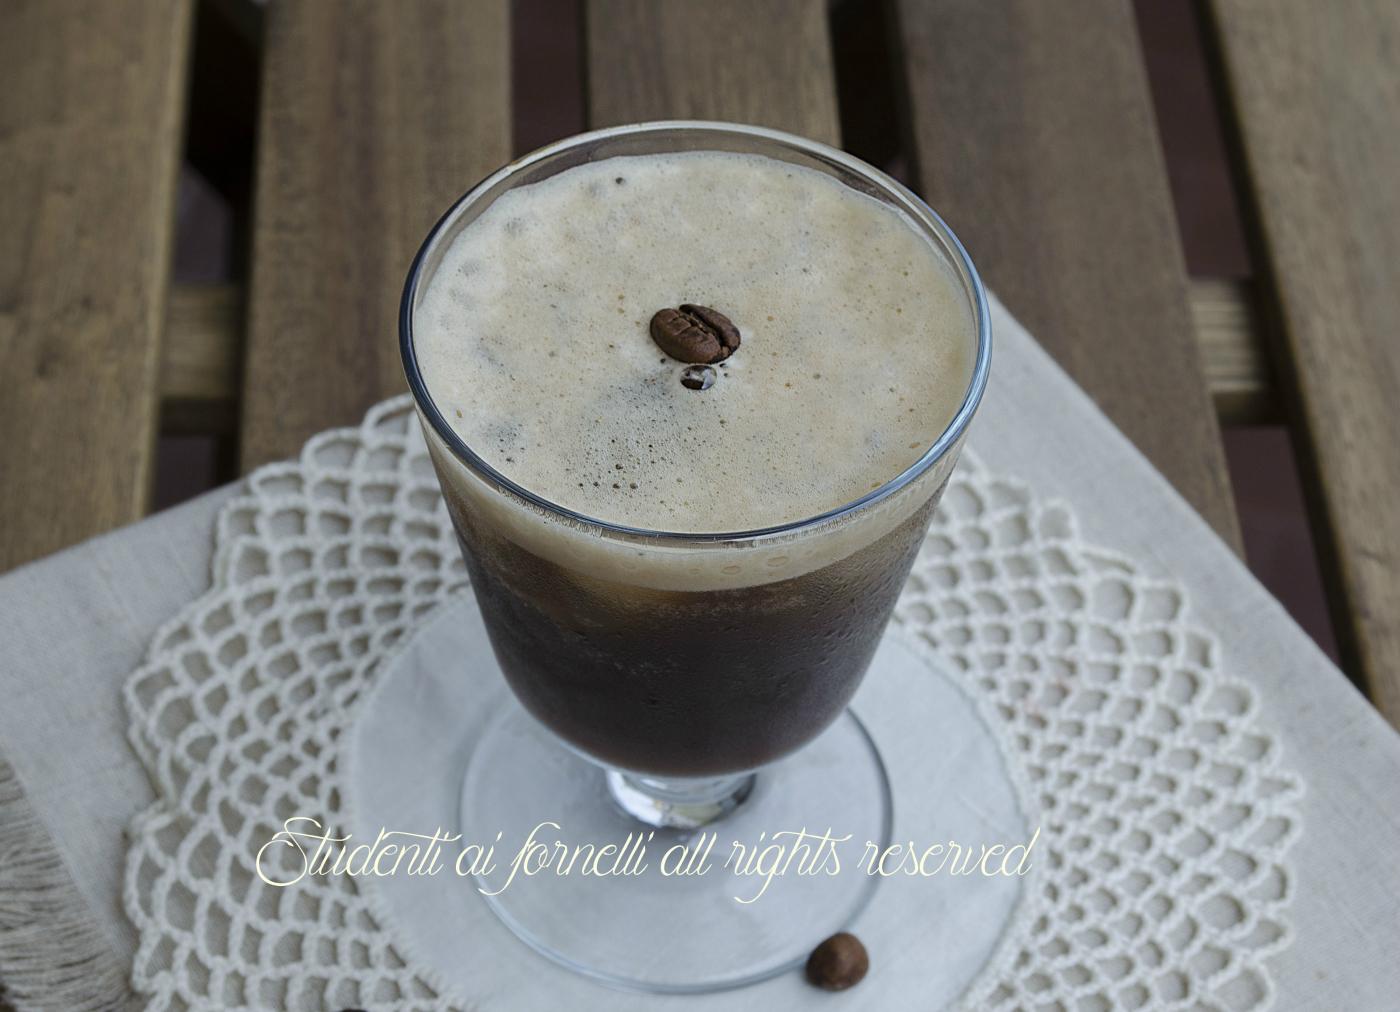 caffè shakerato freddo estivo ricetta estiva-veloce-caffè-freddo